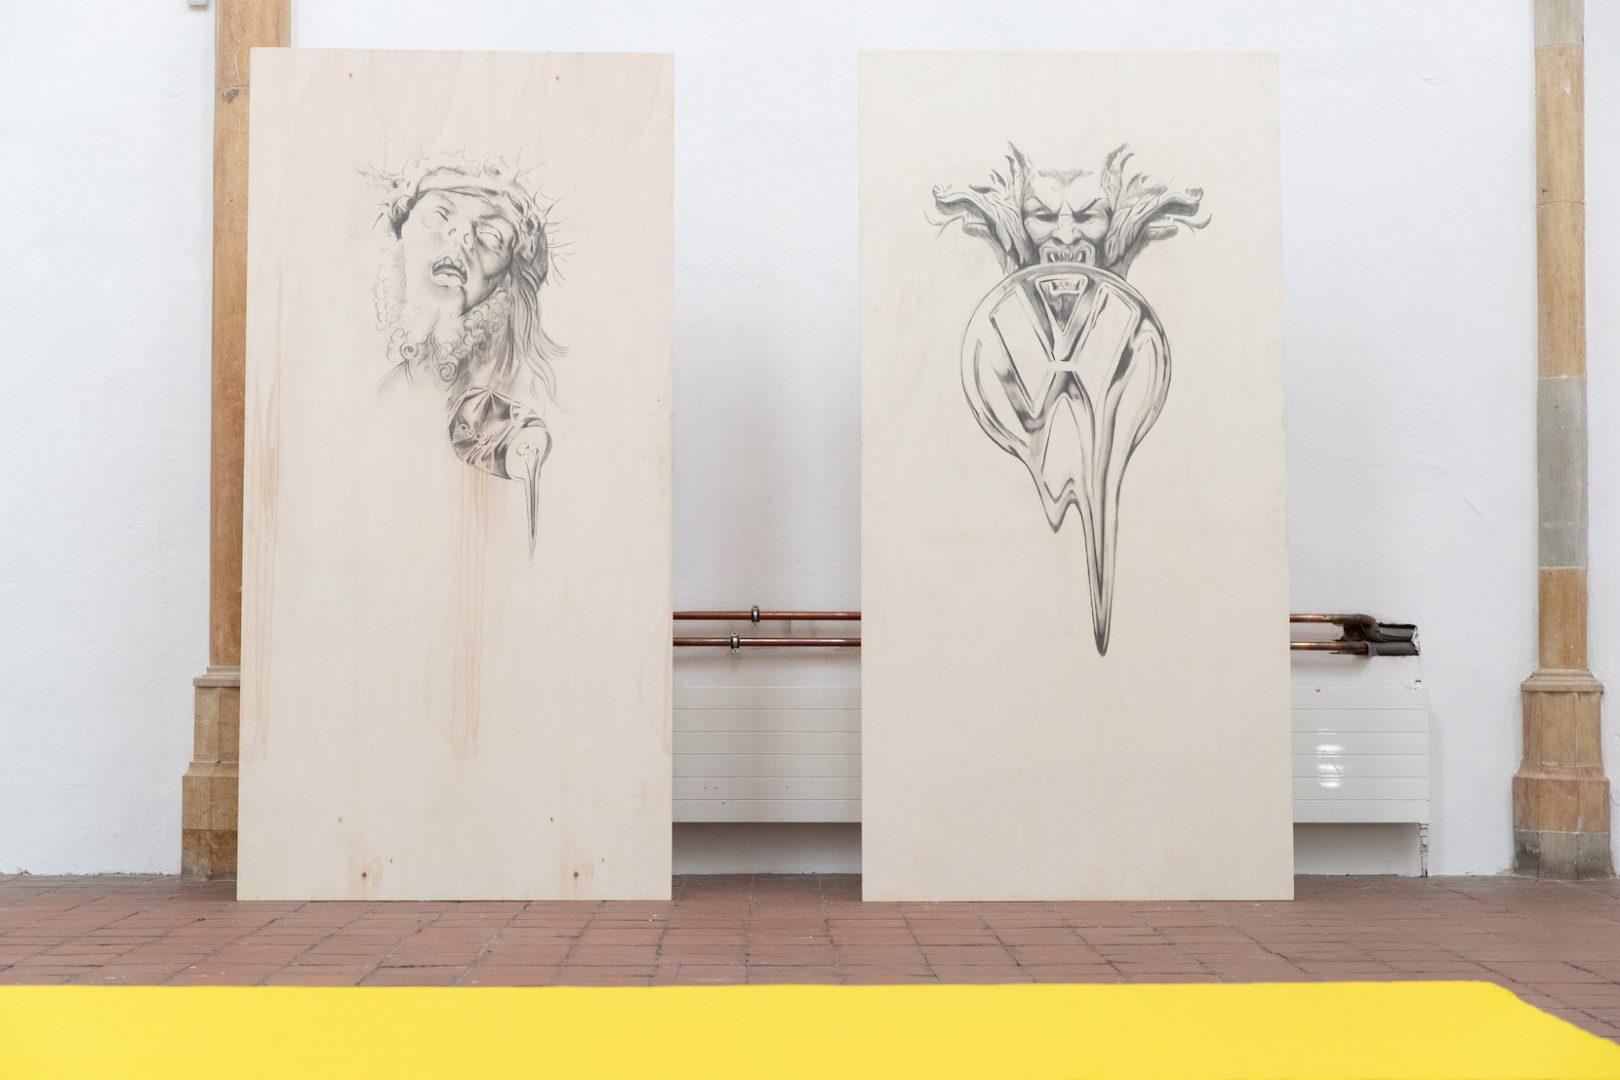 Filip Markiewicz | Celebration Factory, Exhibition View, Kunsthalle Osnabrück, 2019/20. Photo: Filip Markiewicz. Courtesy Filip Markiewicz / Kunsthalle Osnabrück